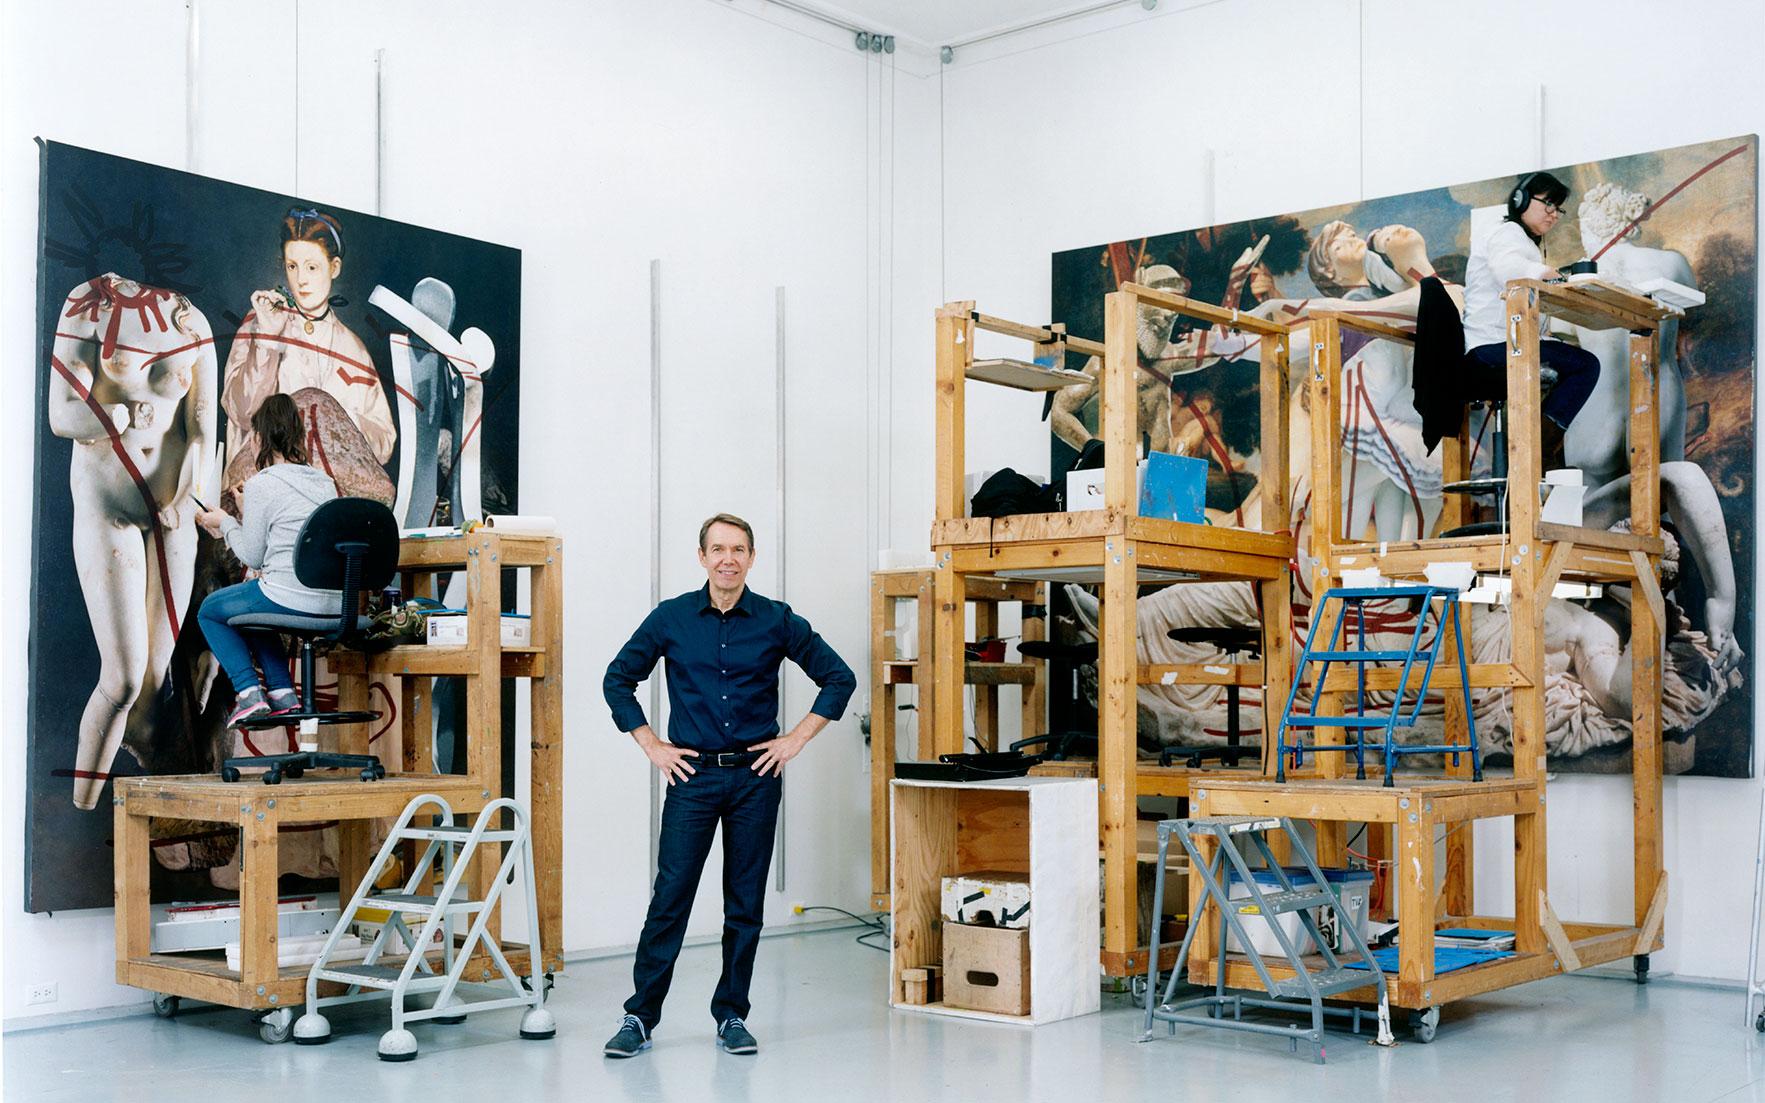 Jeff Koons: 'I love how art ca